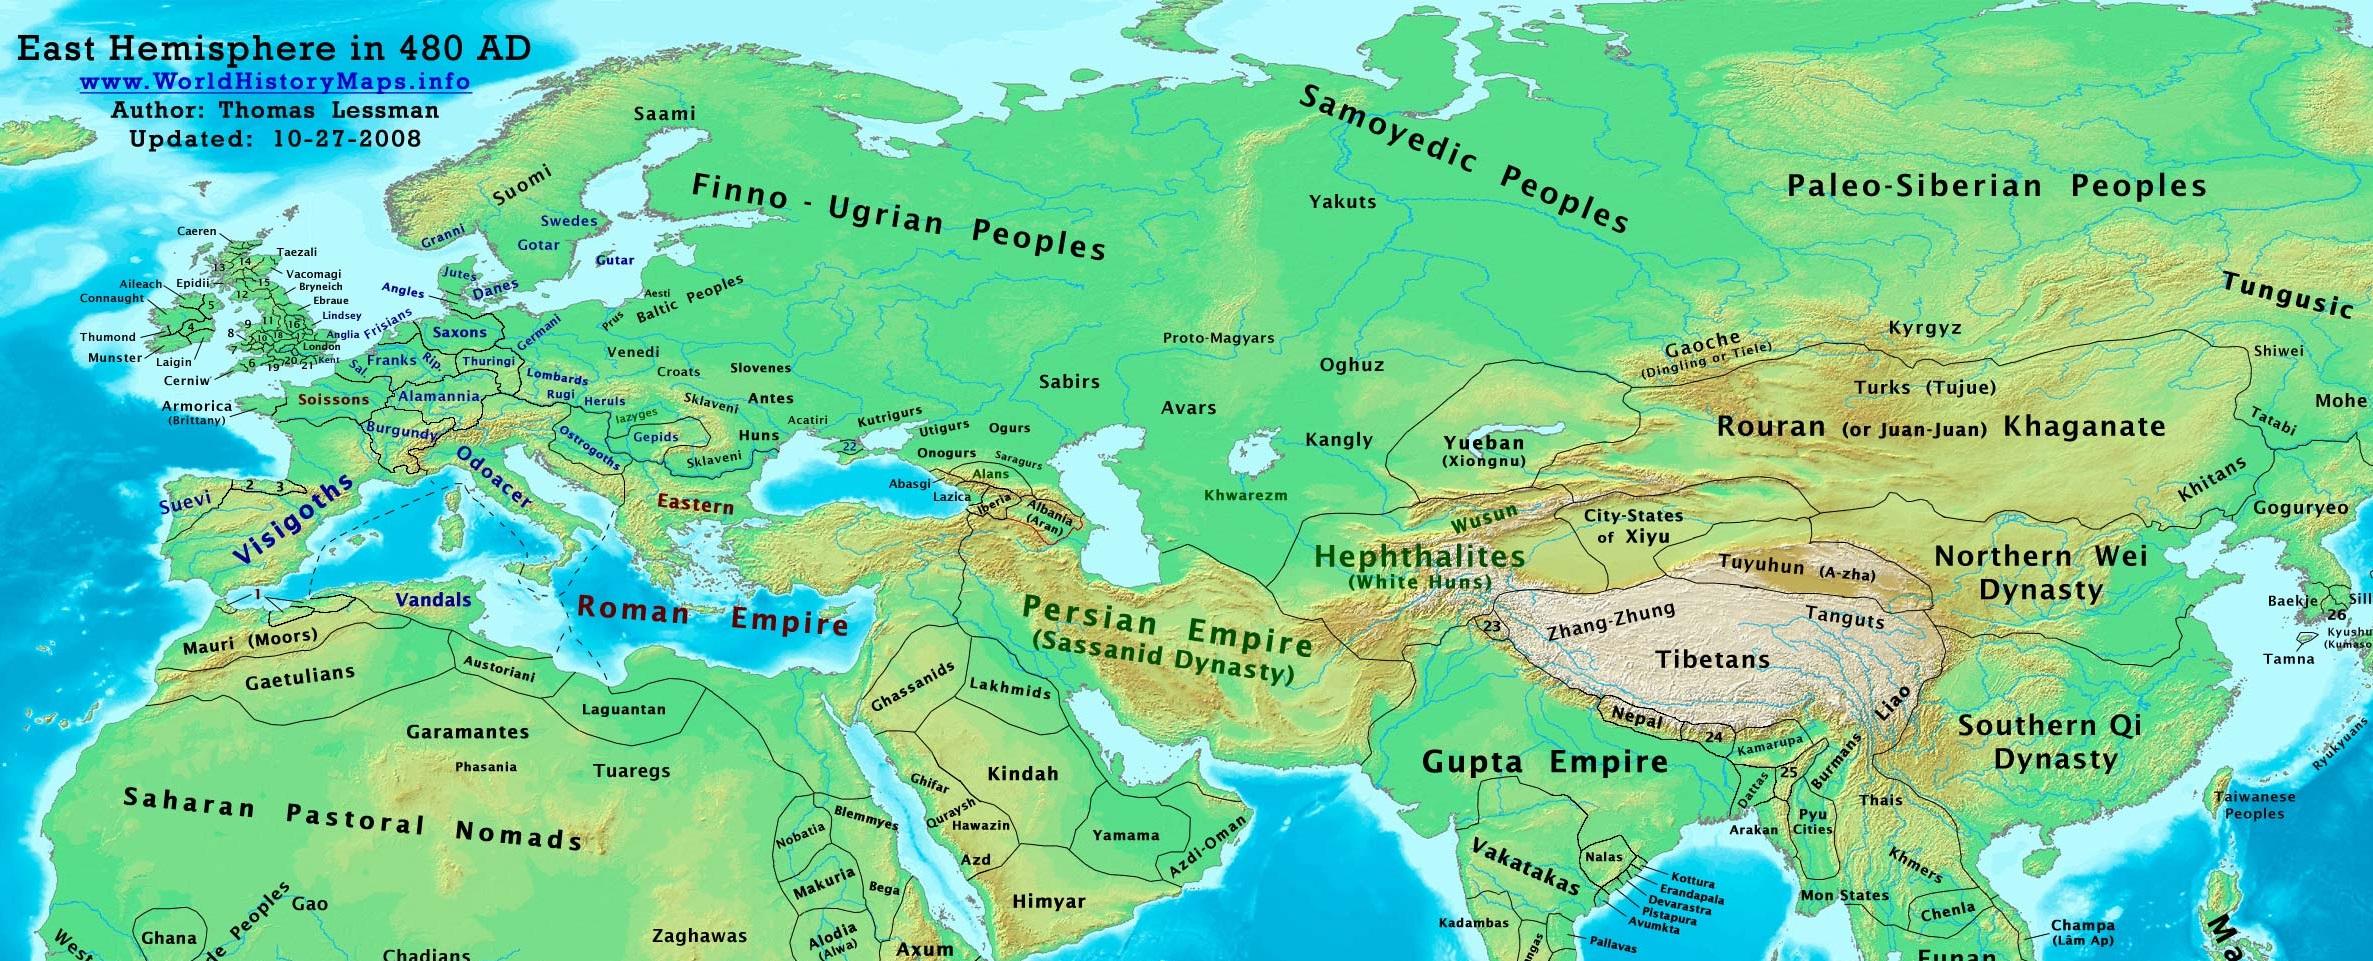 480 AD